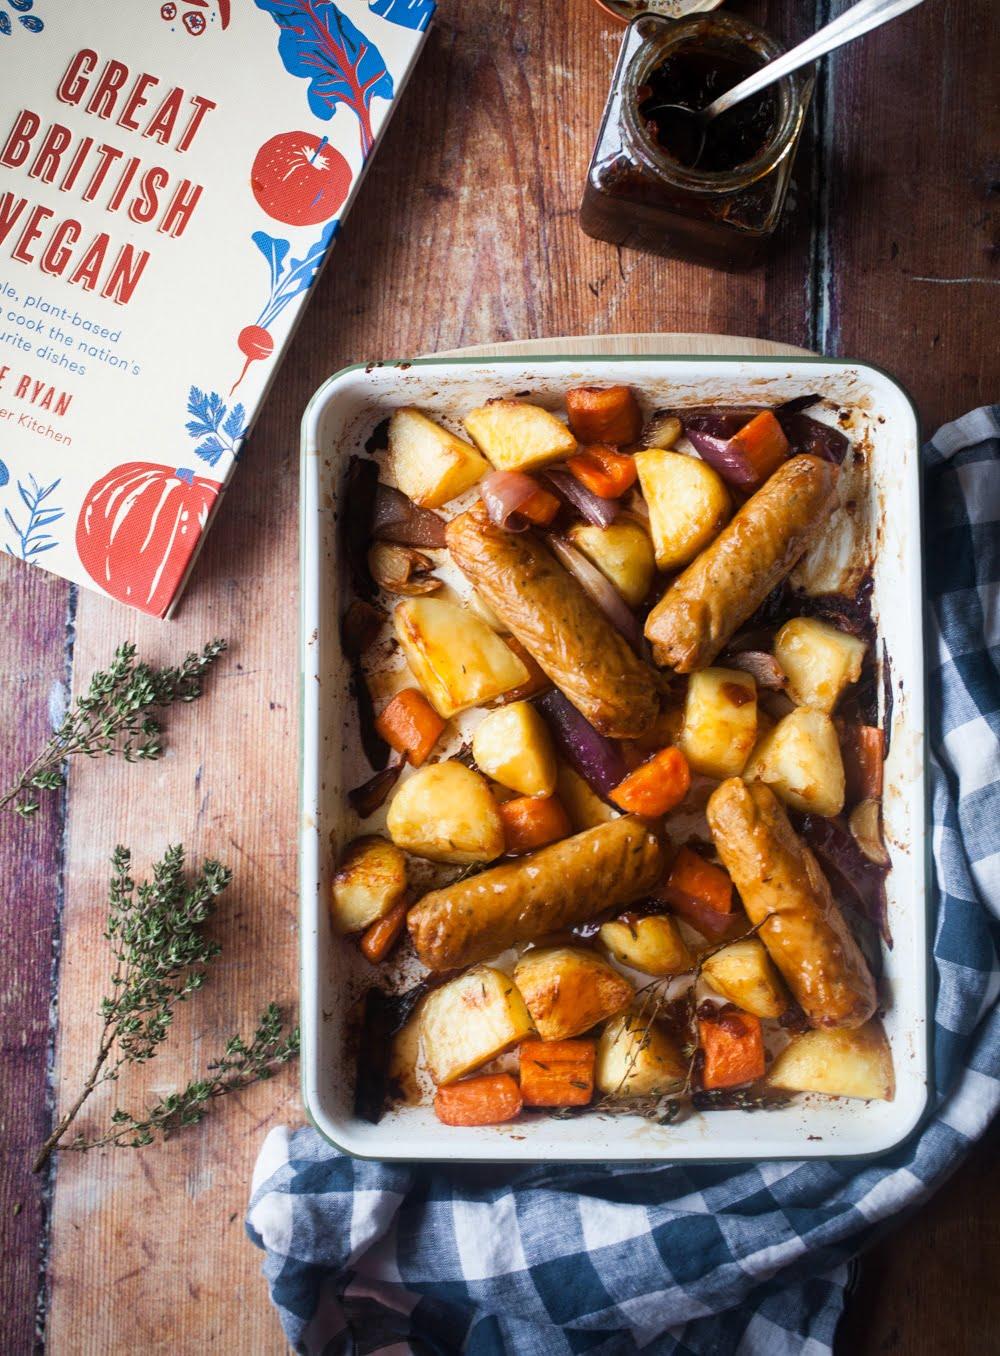 Sticky Sausage & Potato Traybake from Great British Vegan by Aimee Ryan